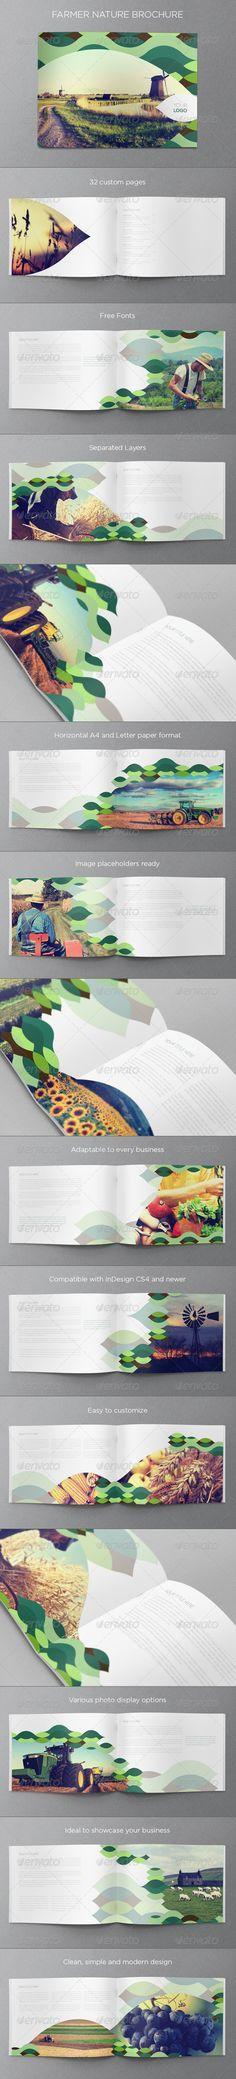 Broschüre - Print Inspiration